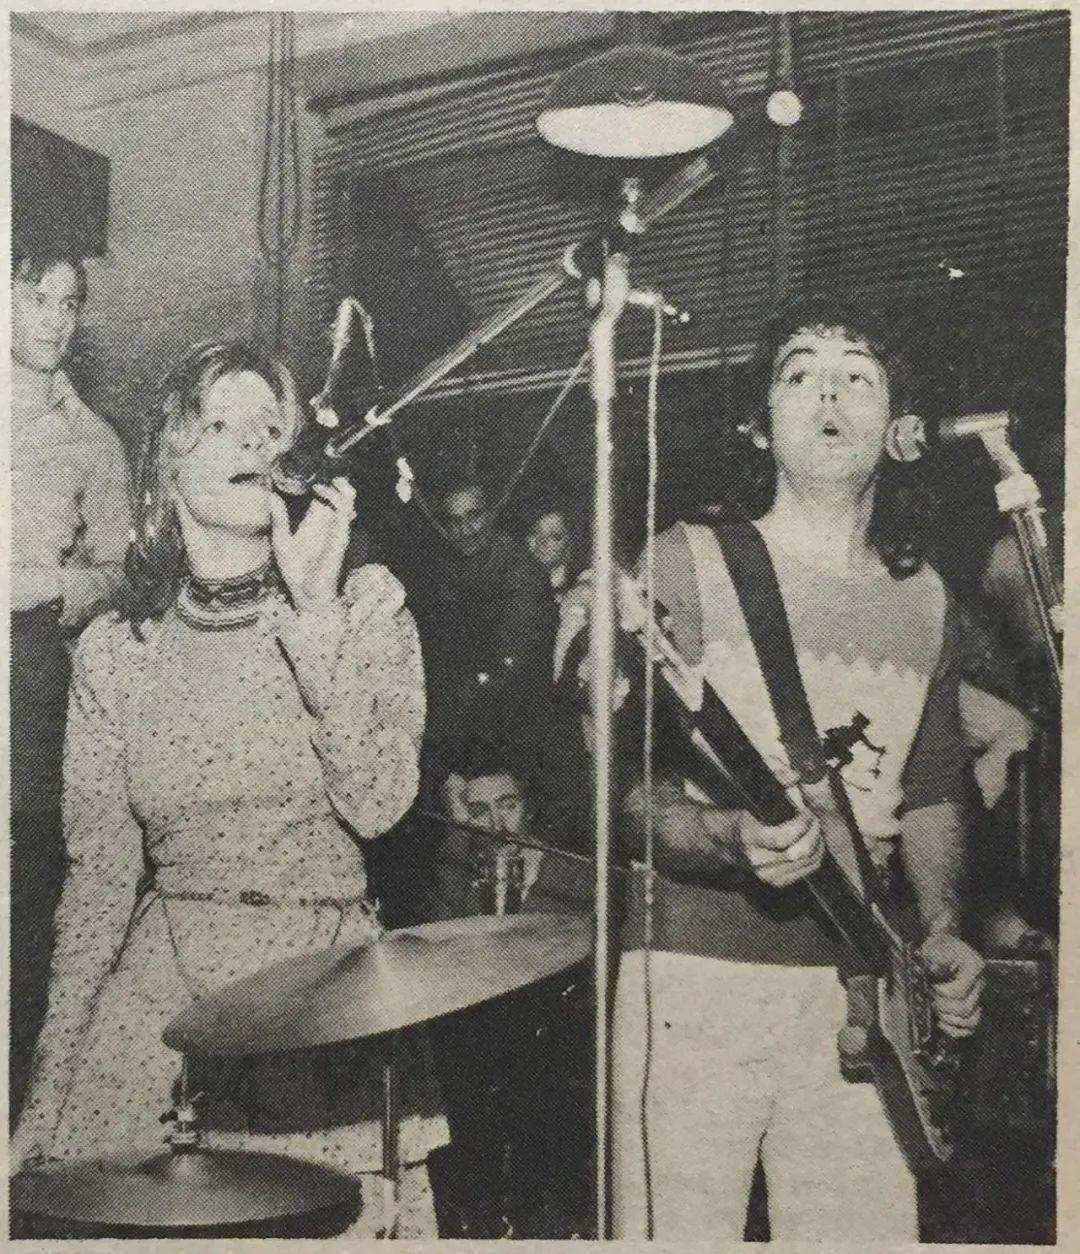 Paul McCartney在餐厅举行即兴音乐会。